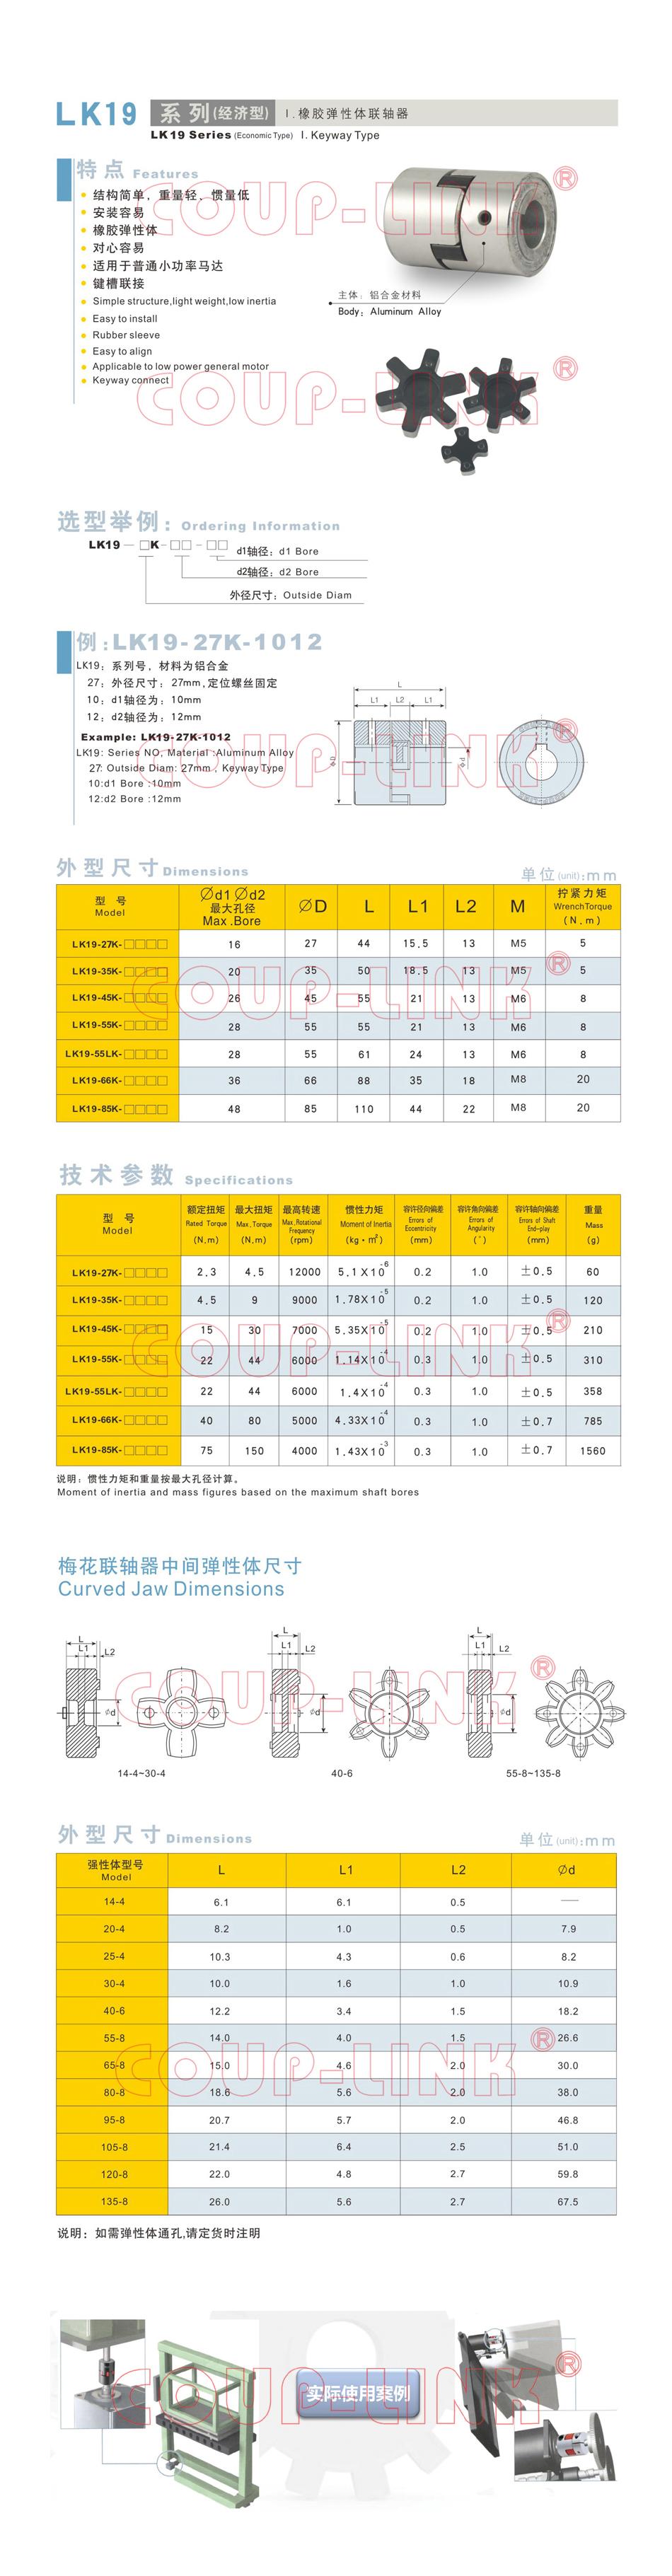 LK19系列(經濟型) 橡膠彈性體老子有钱app_老子有钱app種類-廣州老子有钱自動化設備有限公司